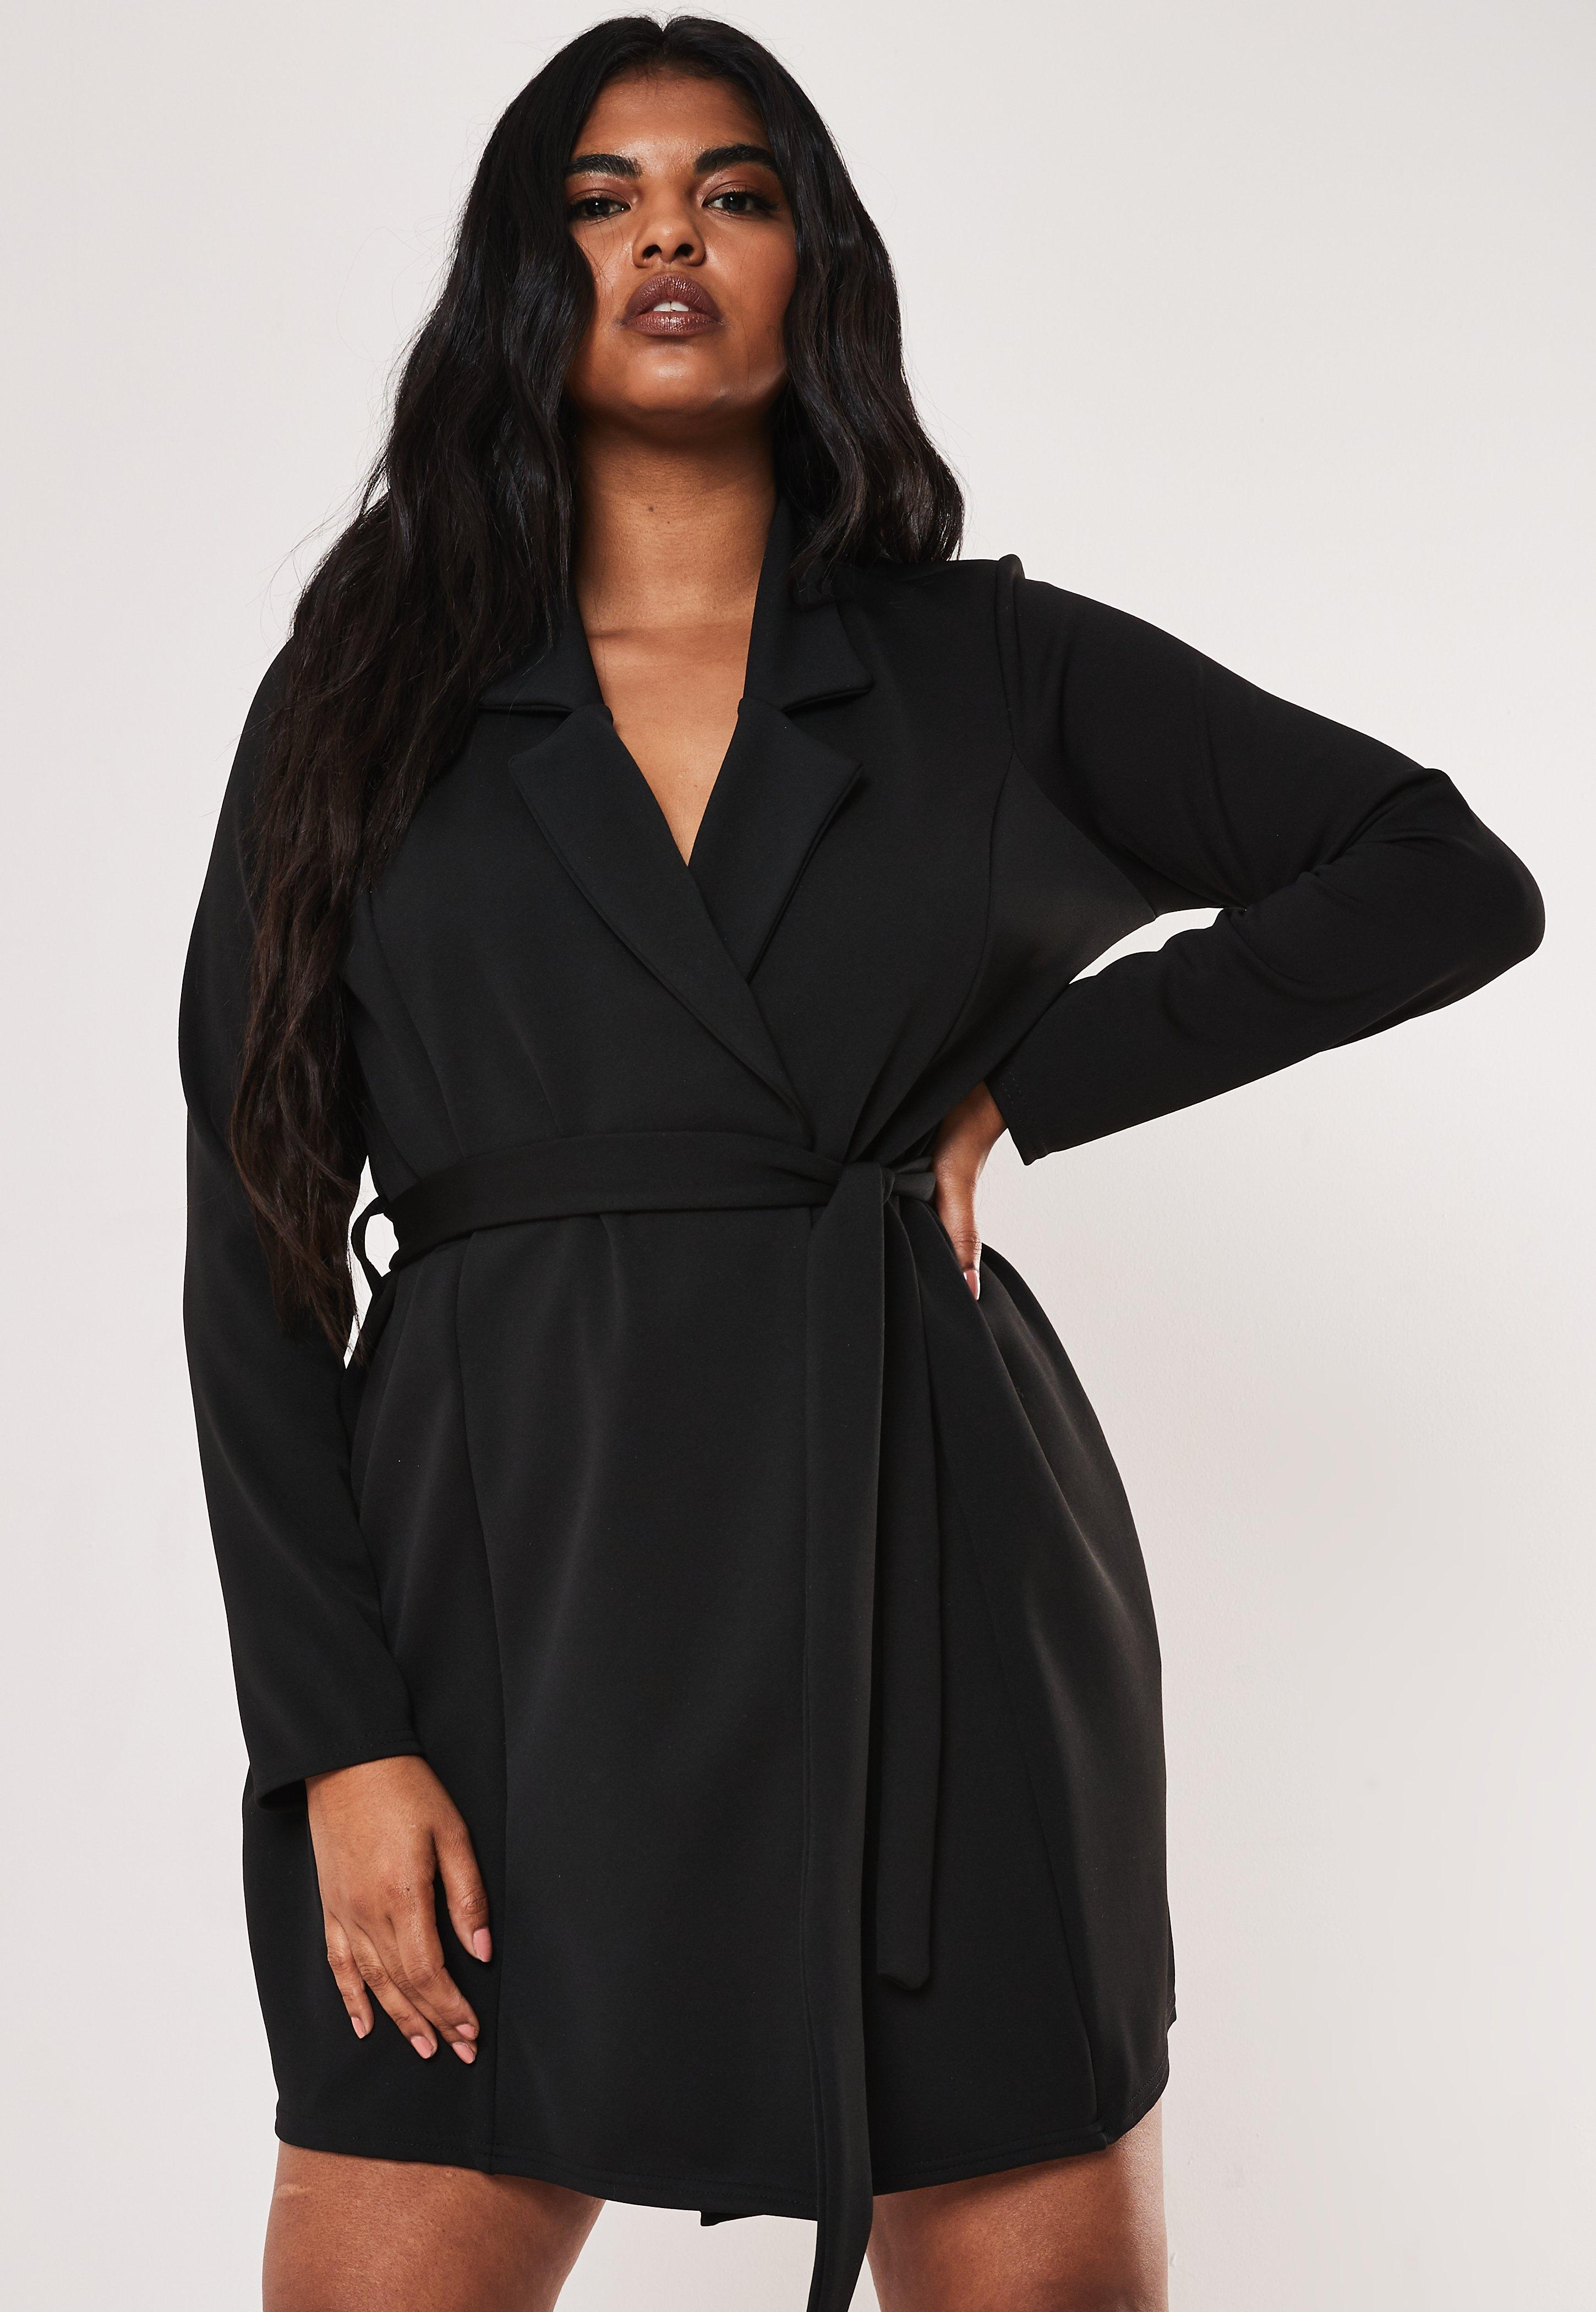 Plus Size Black Belted Blazer Dress